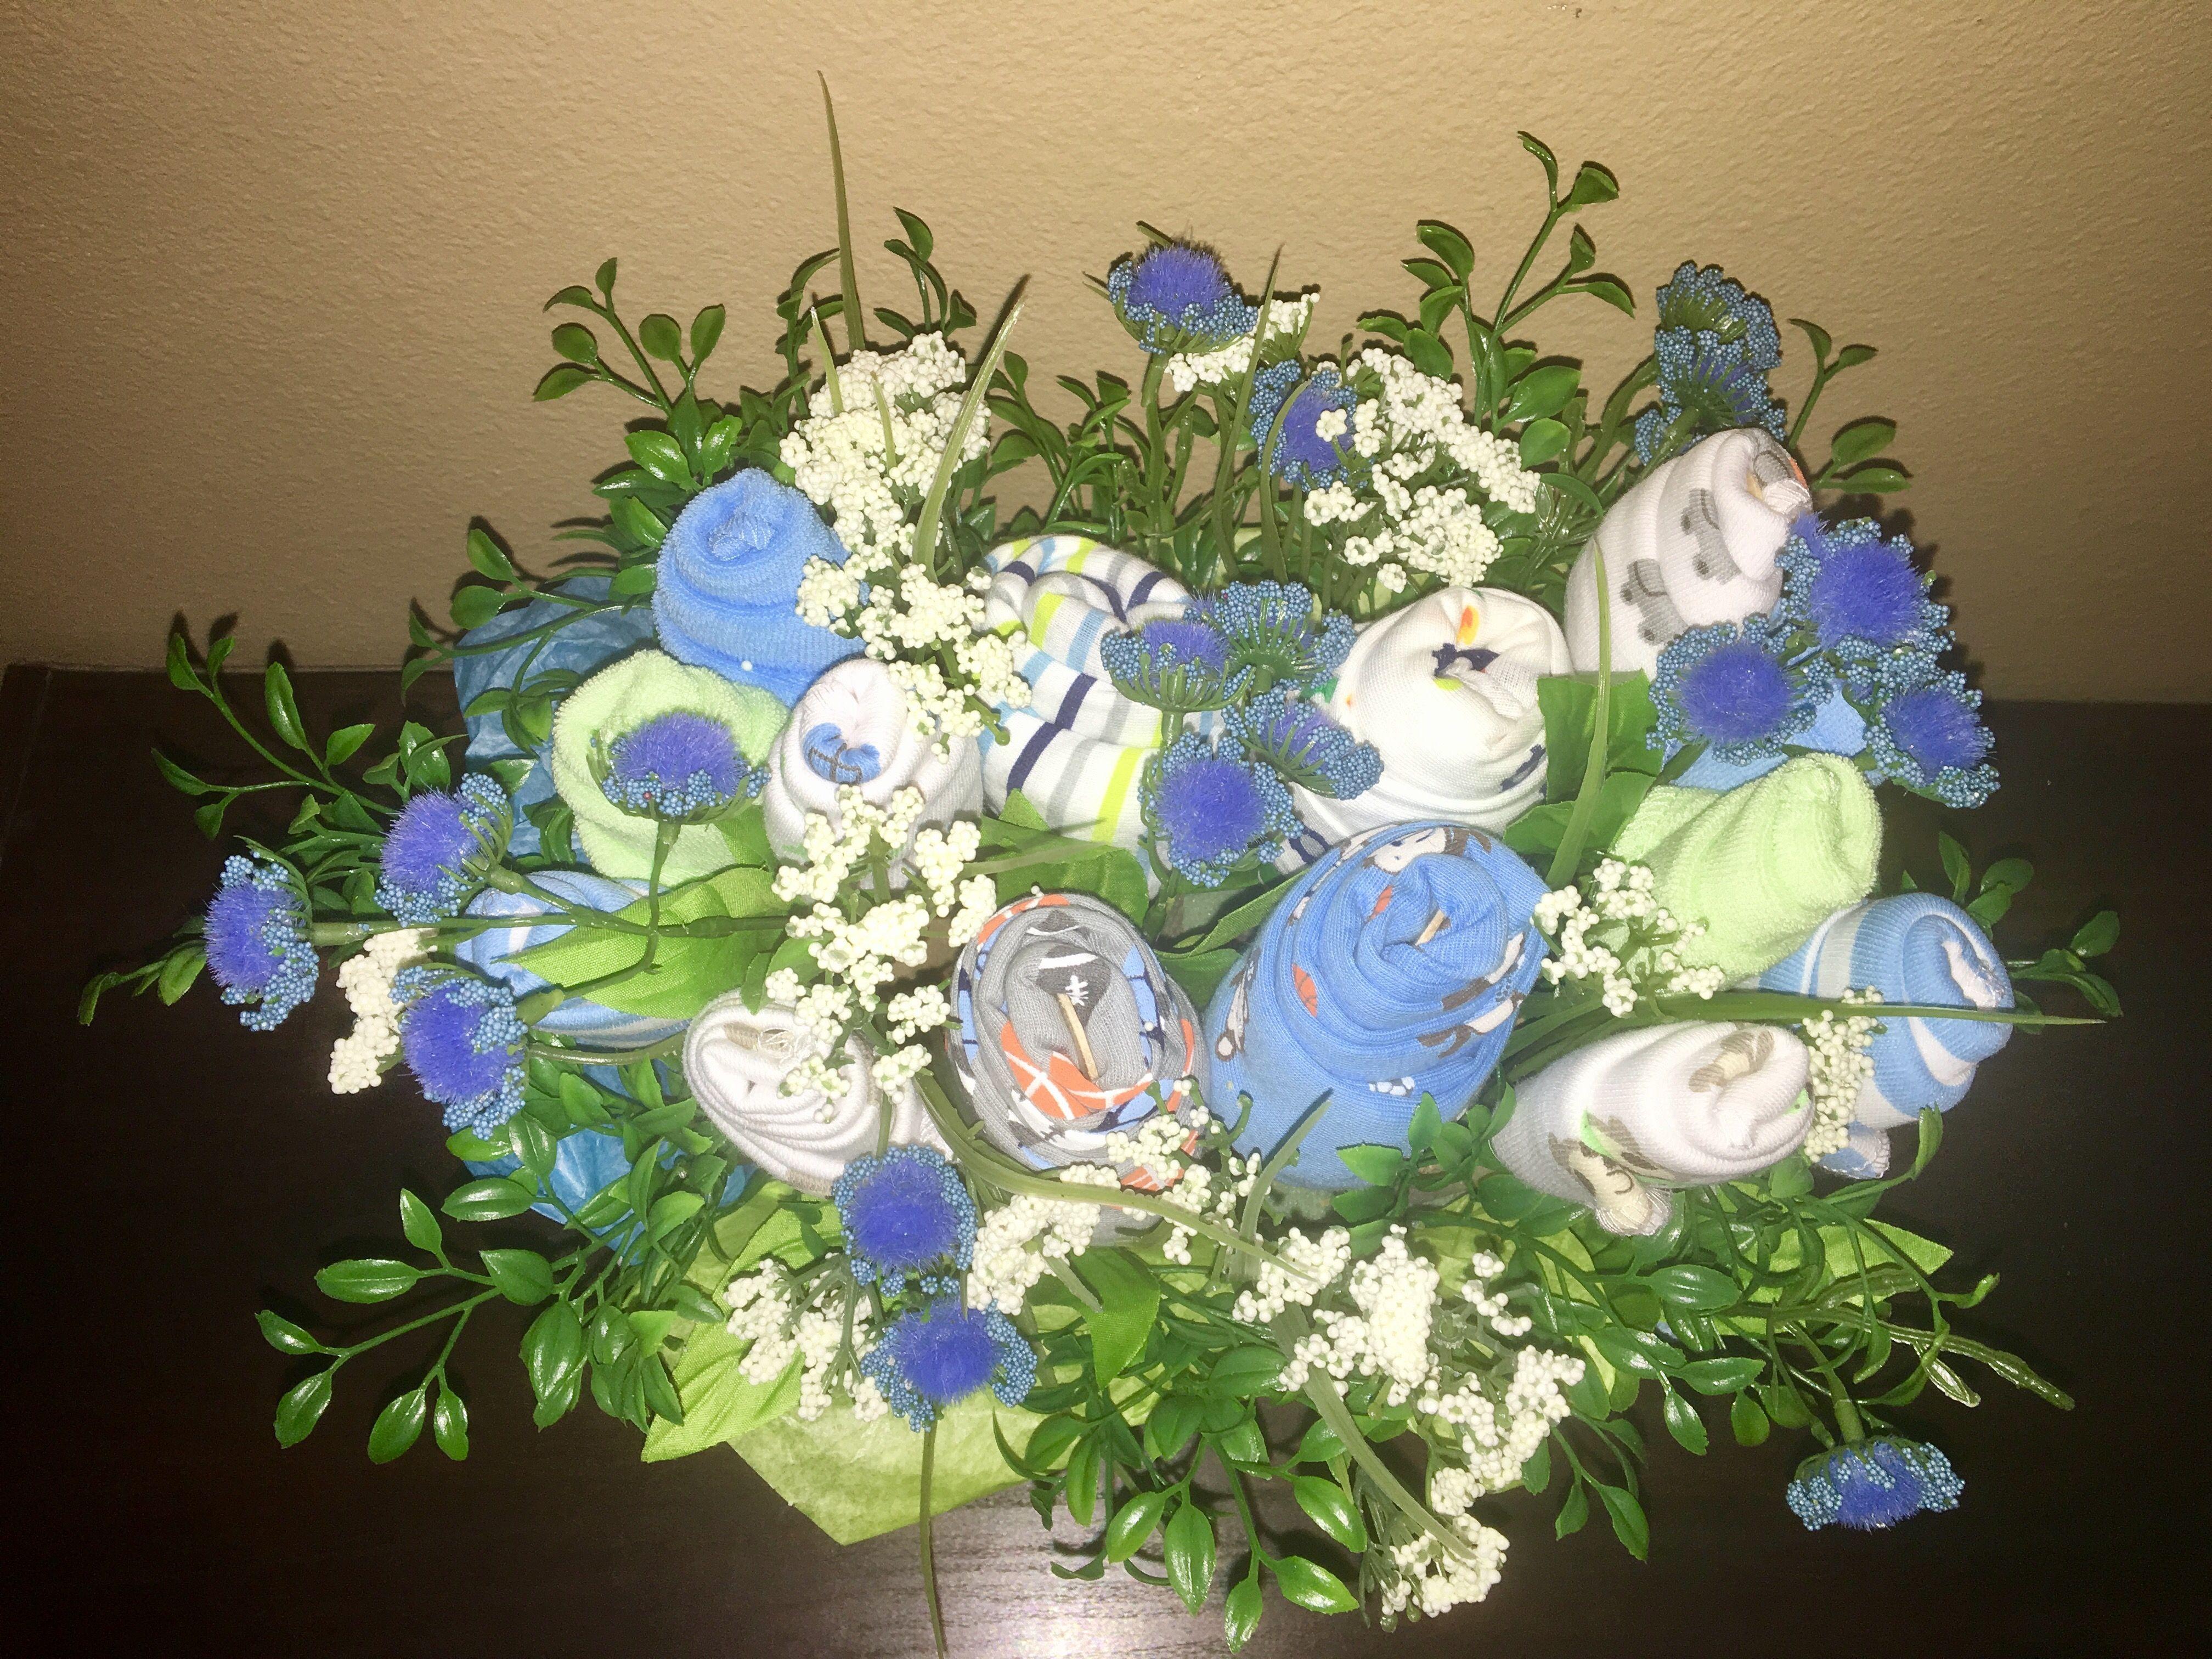 Onesie Flower Bouquet Images - Flower Wallpaper HD